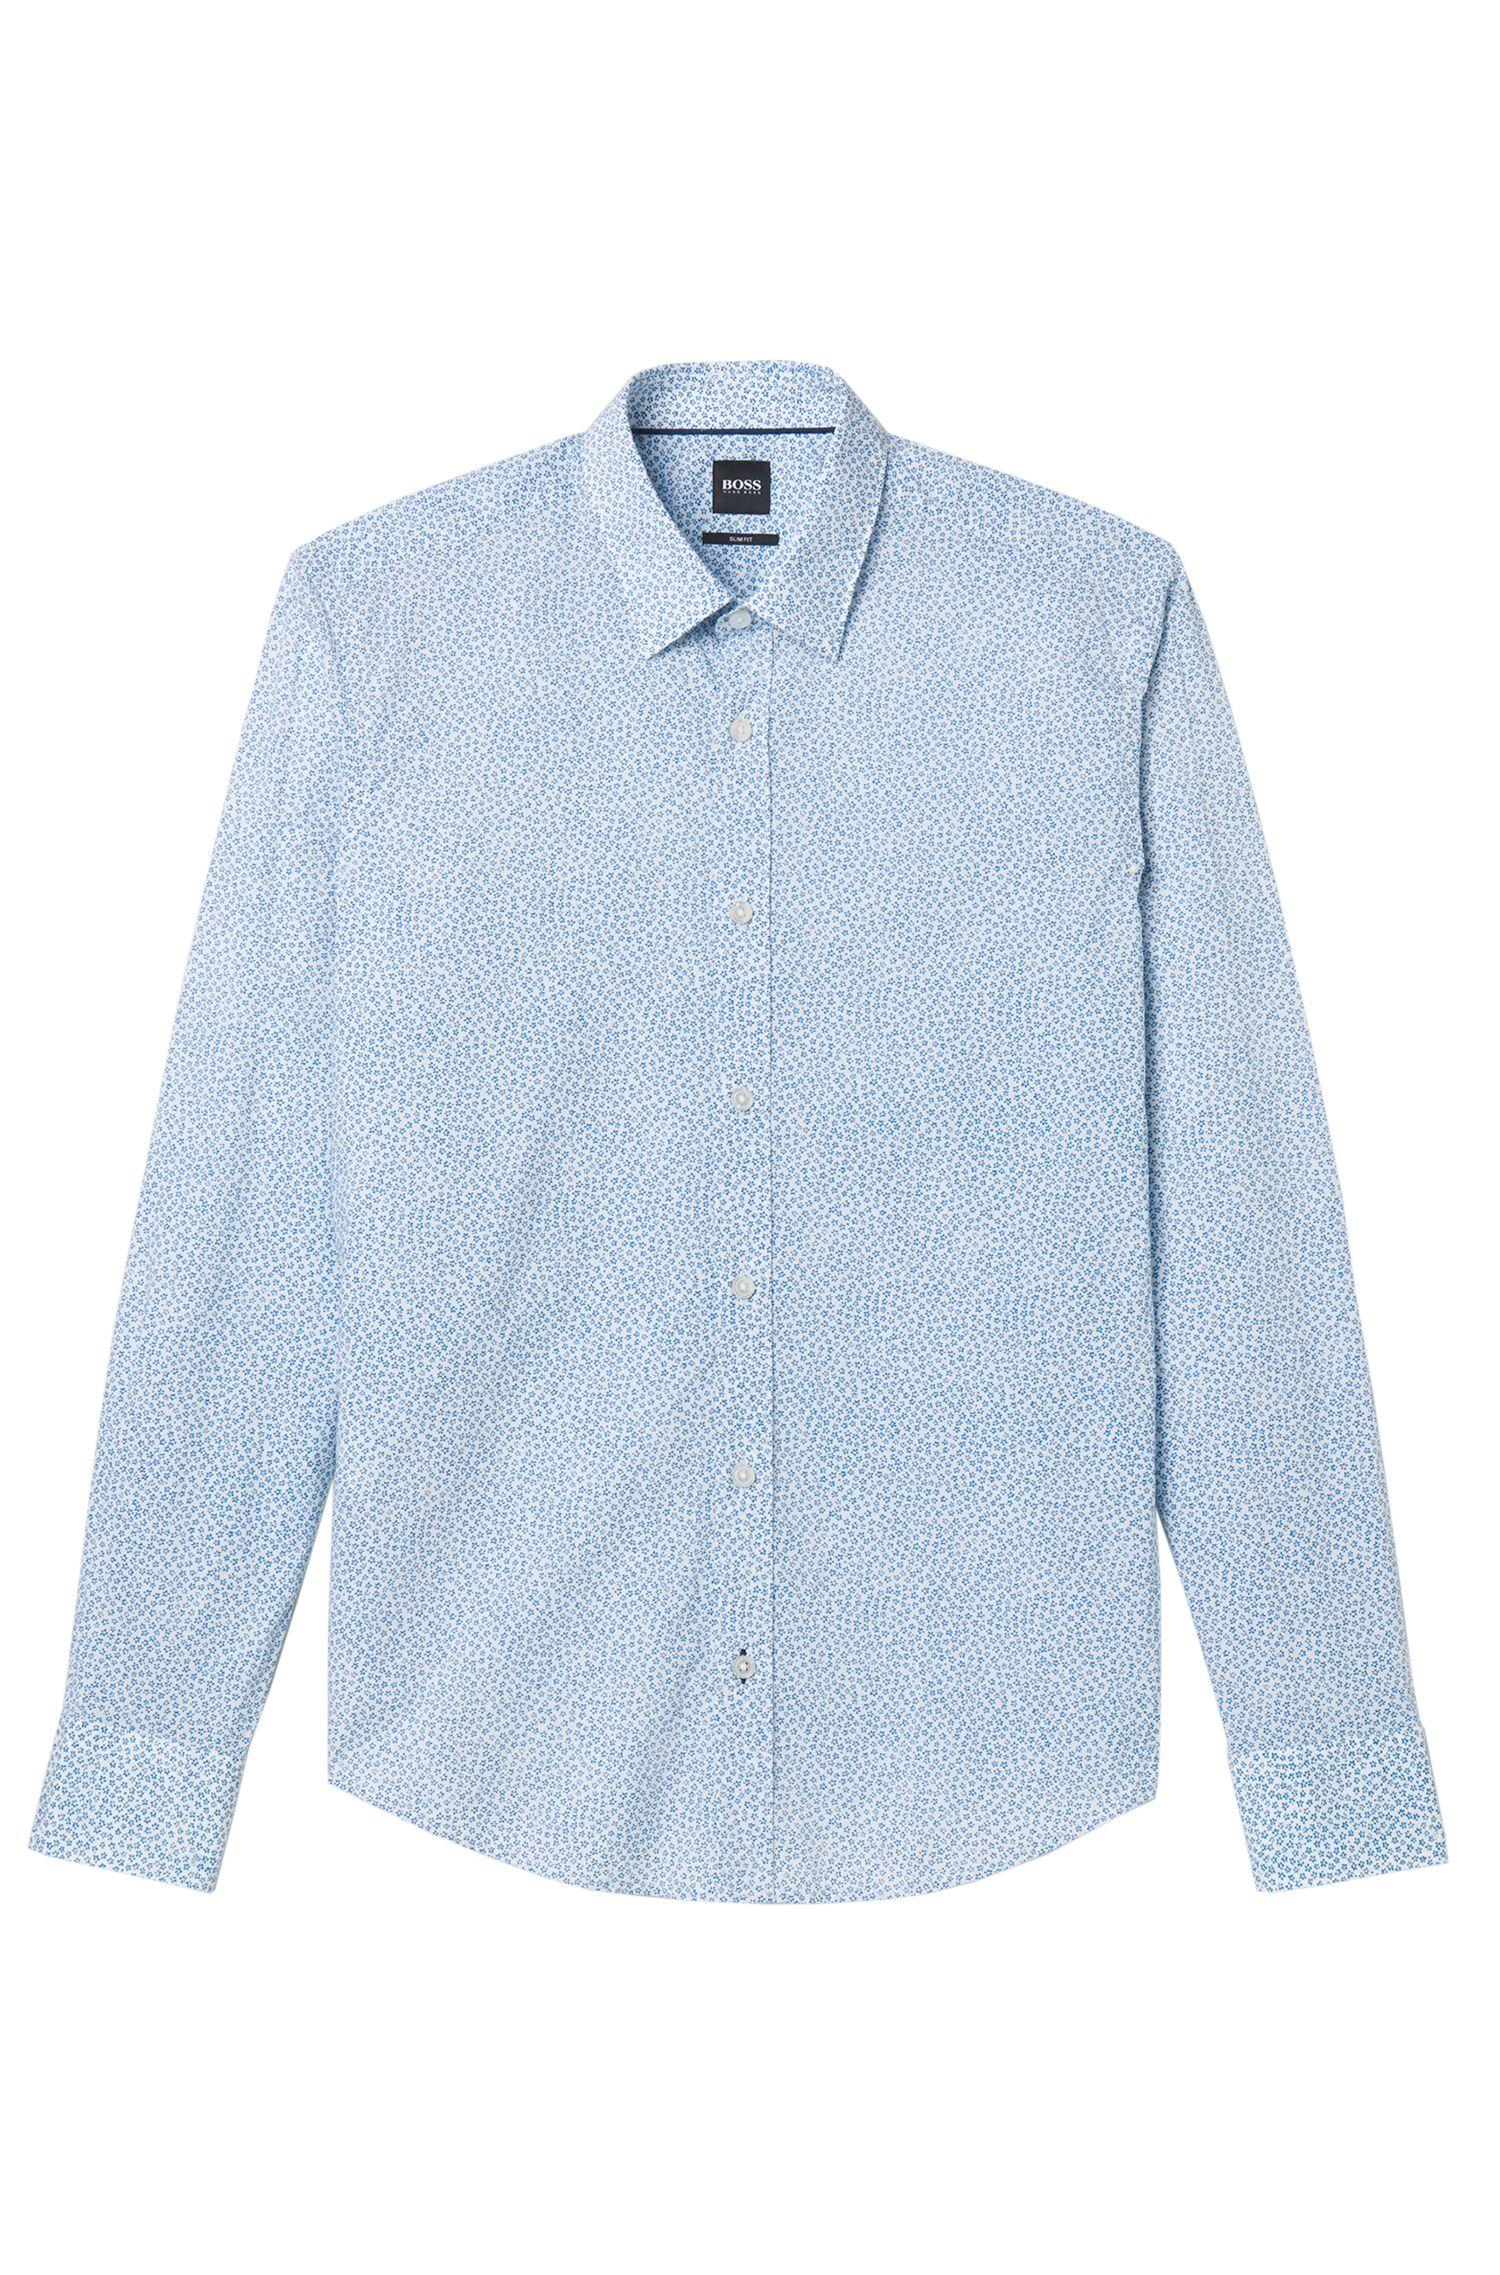 Cotton Flower Print Sport Shirt, Slim Fit | Reid, Turquoise